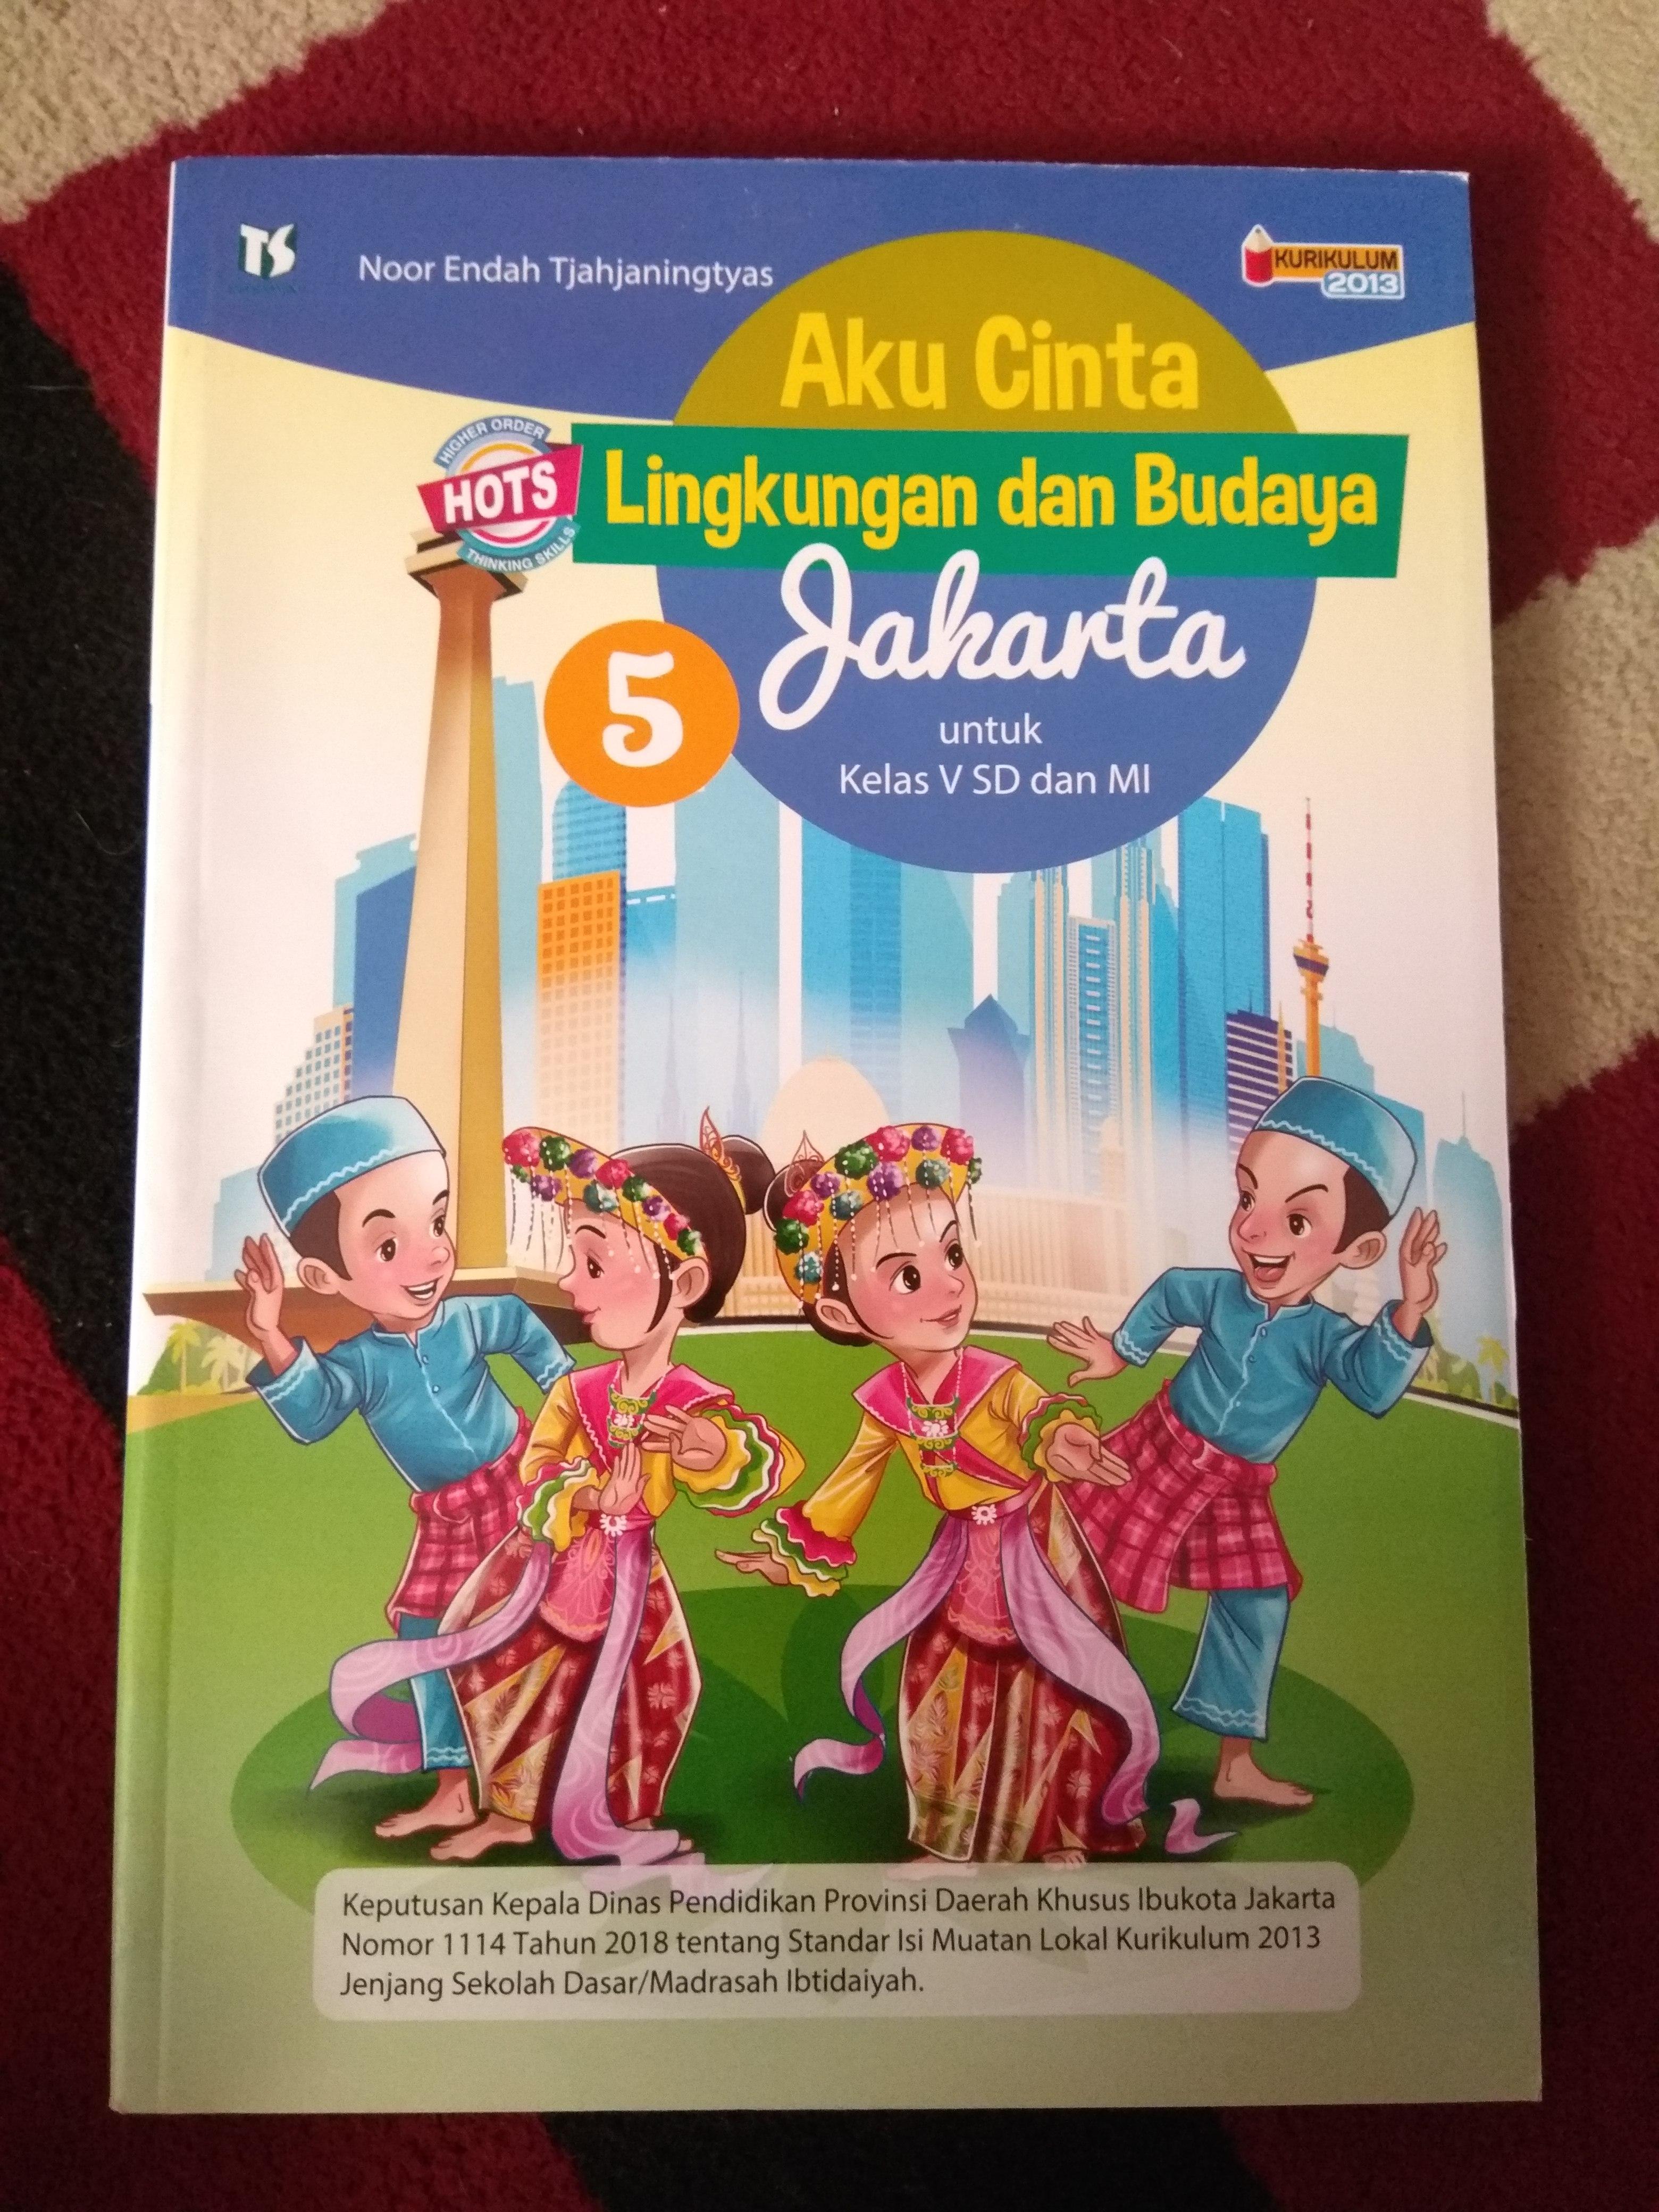 buku agama, buku tematik, buku guru, buku siswa, buku belajar. Buku Plbj Kelas 5 Sd Erlangga Info Terkait Buku